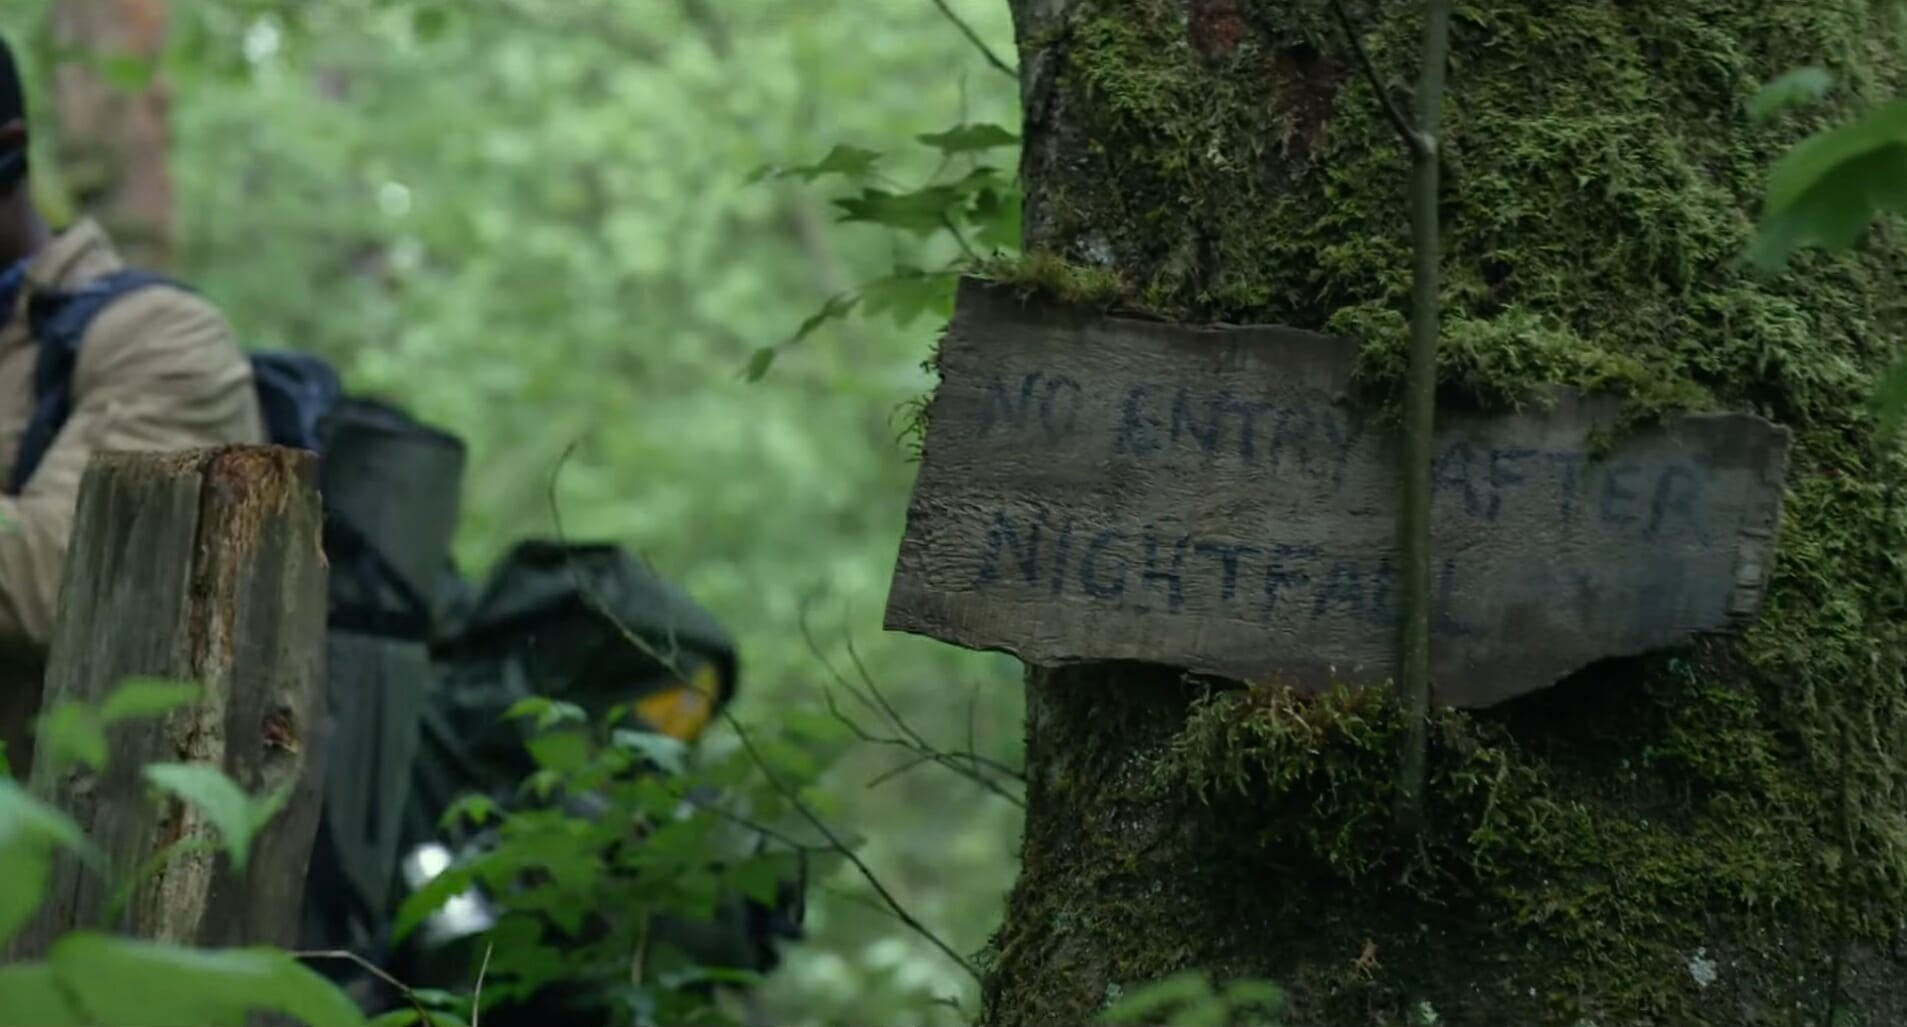 good scary movies on hulu : Blair witch